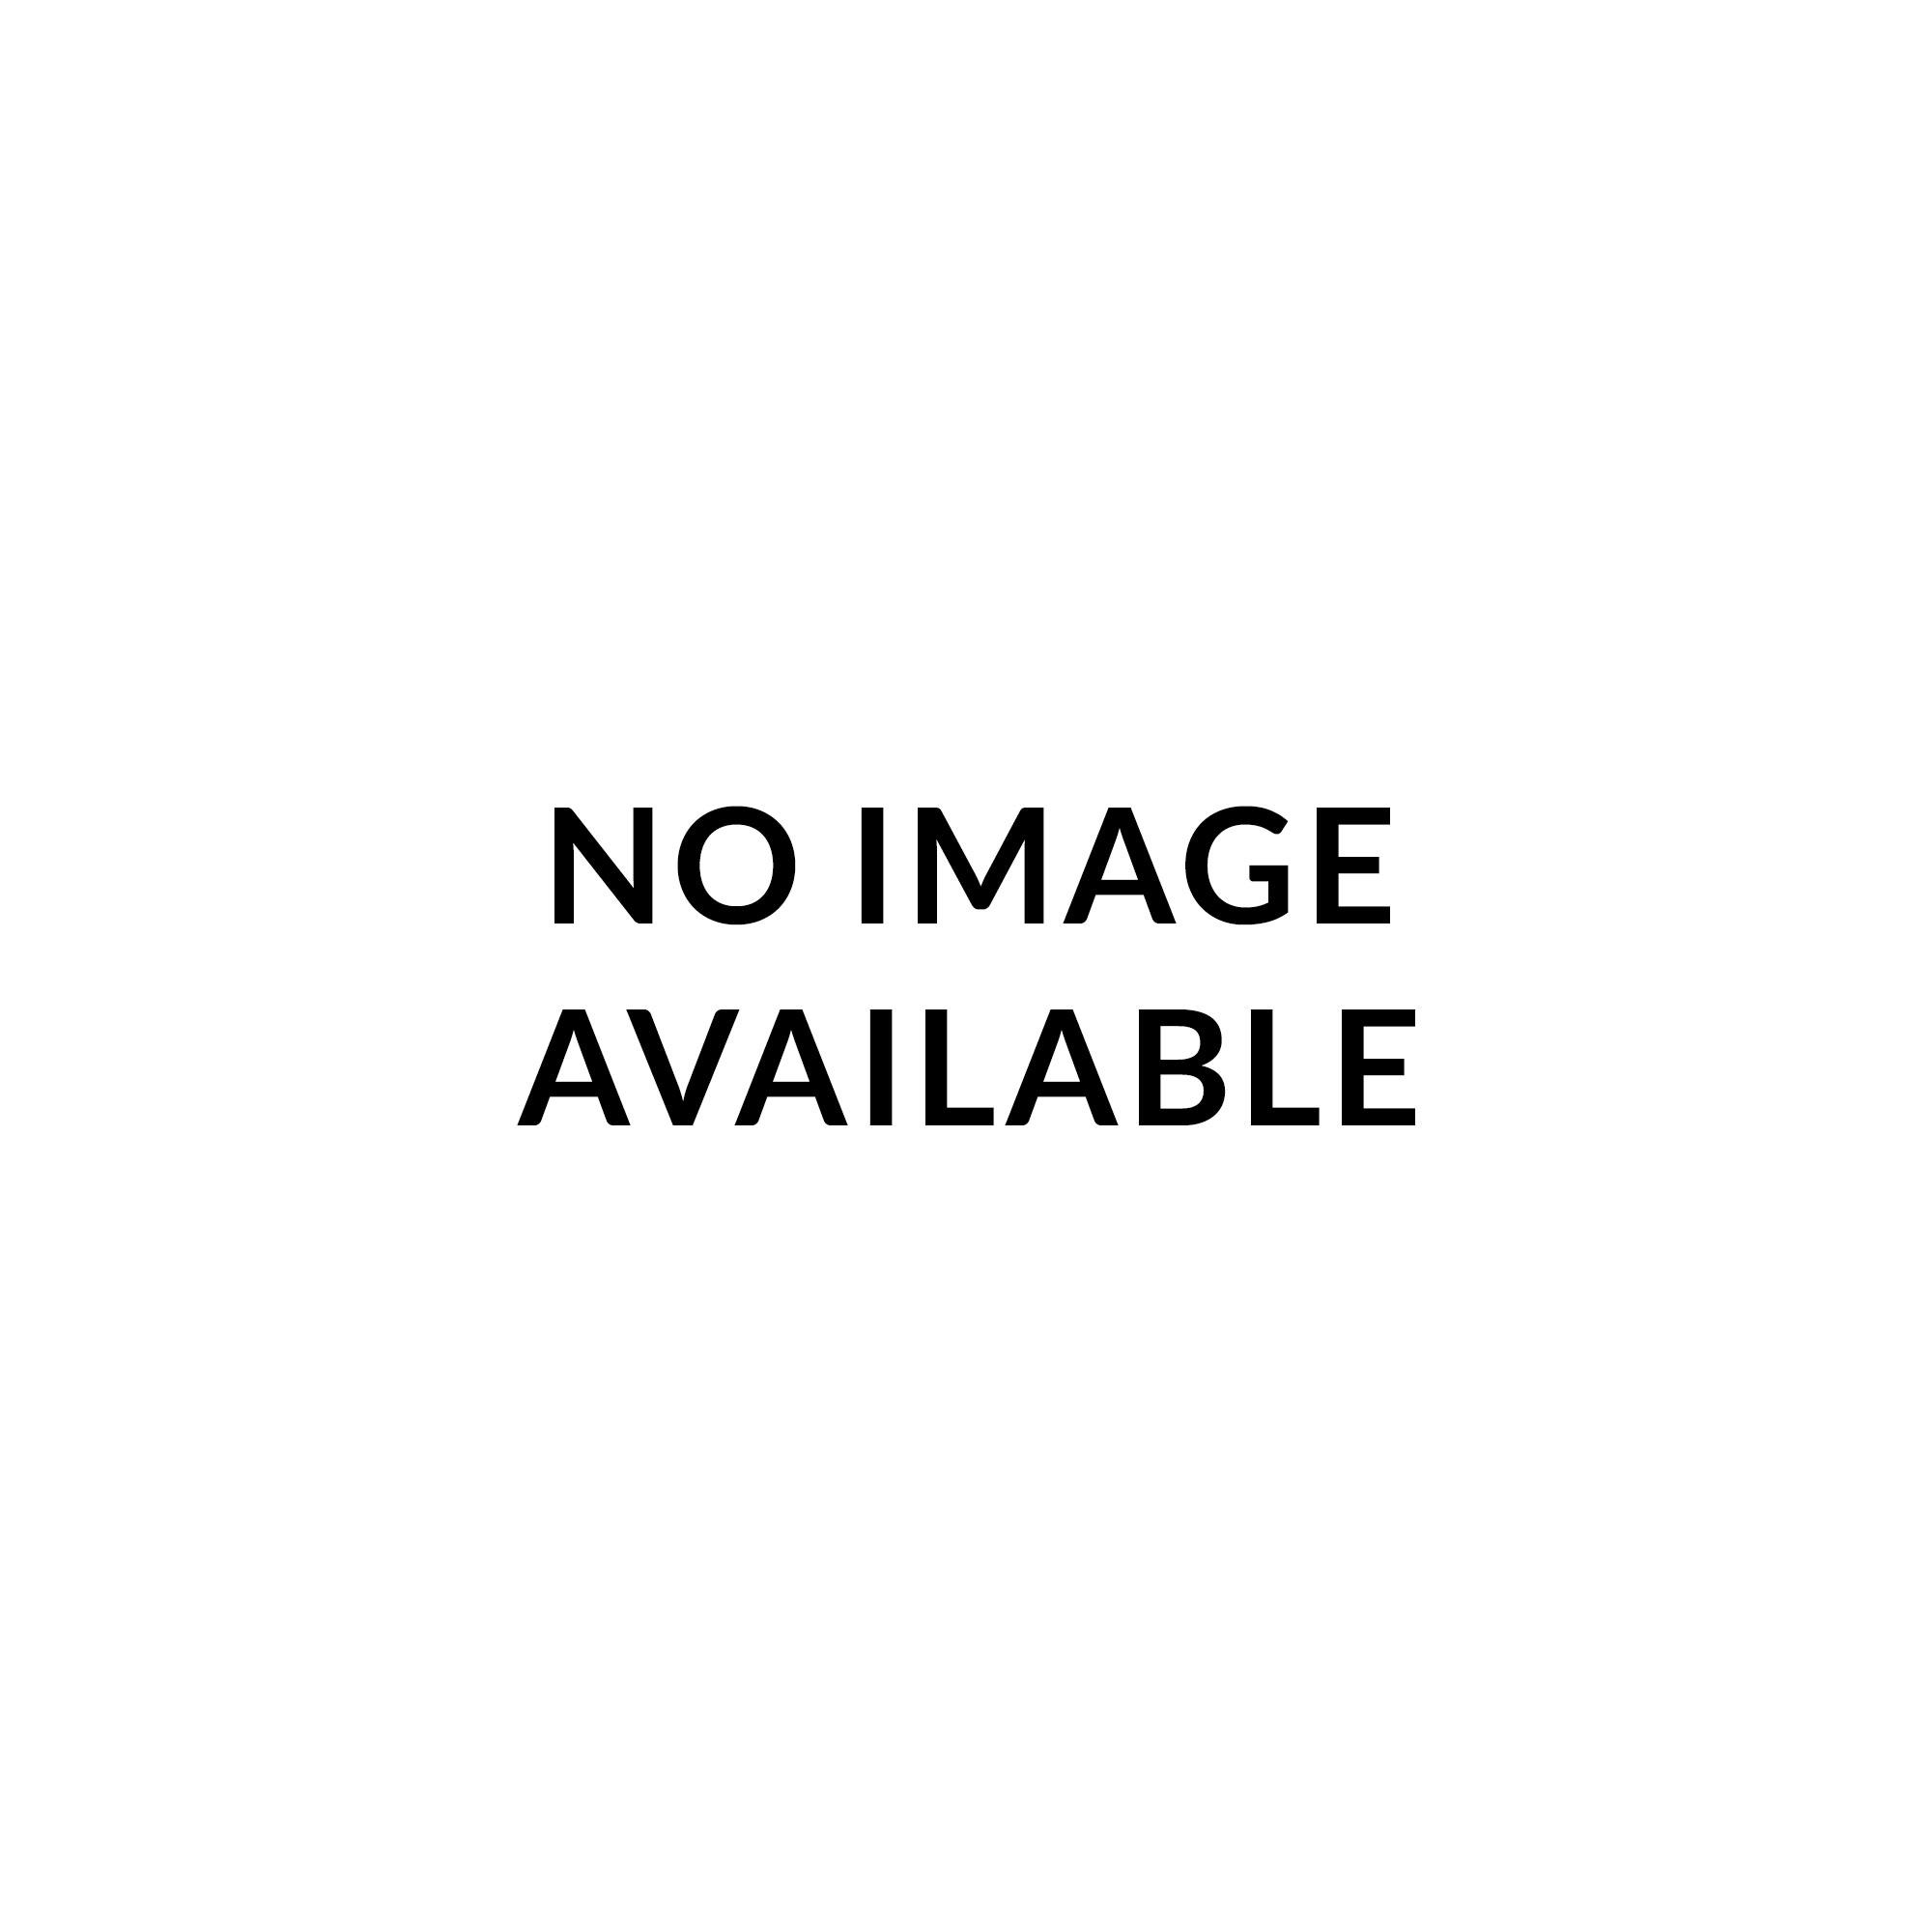 DiMarzio ClipLock Quick Release Guitar Strap with Skulls Design